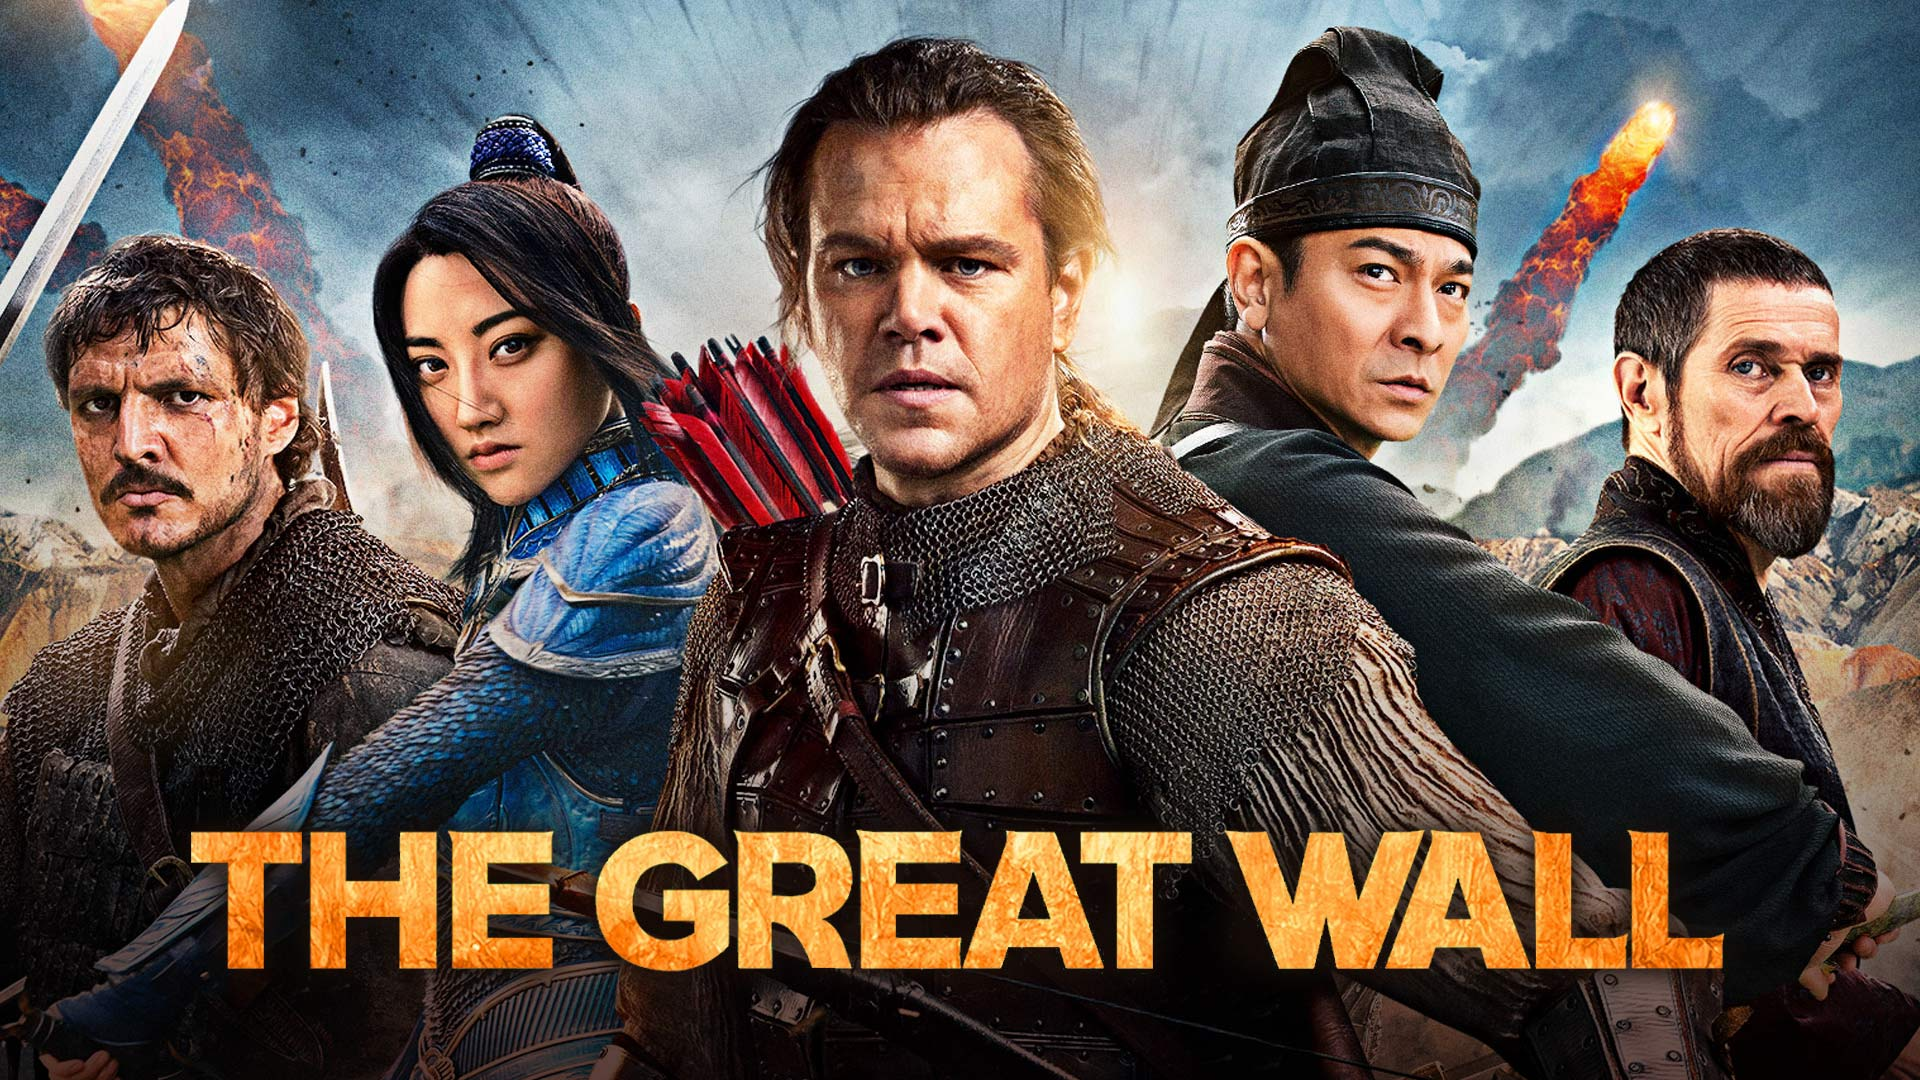 The Great Wall (4K UHD)